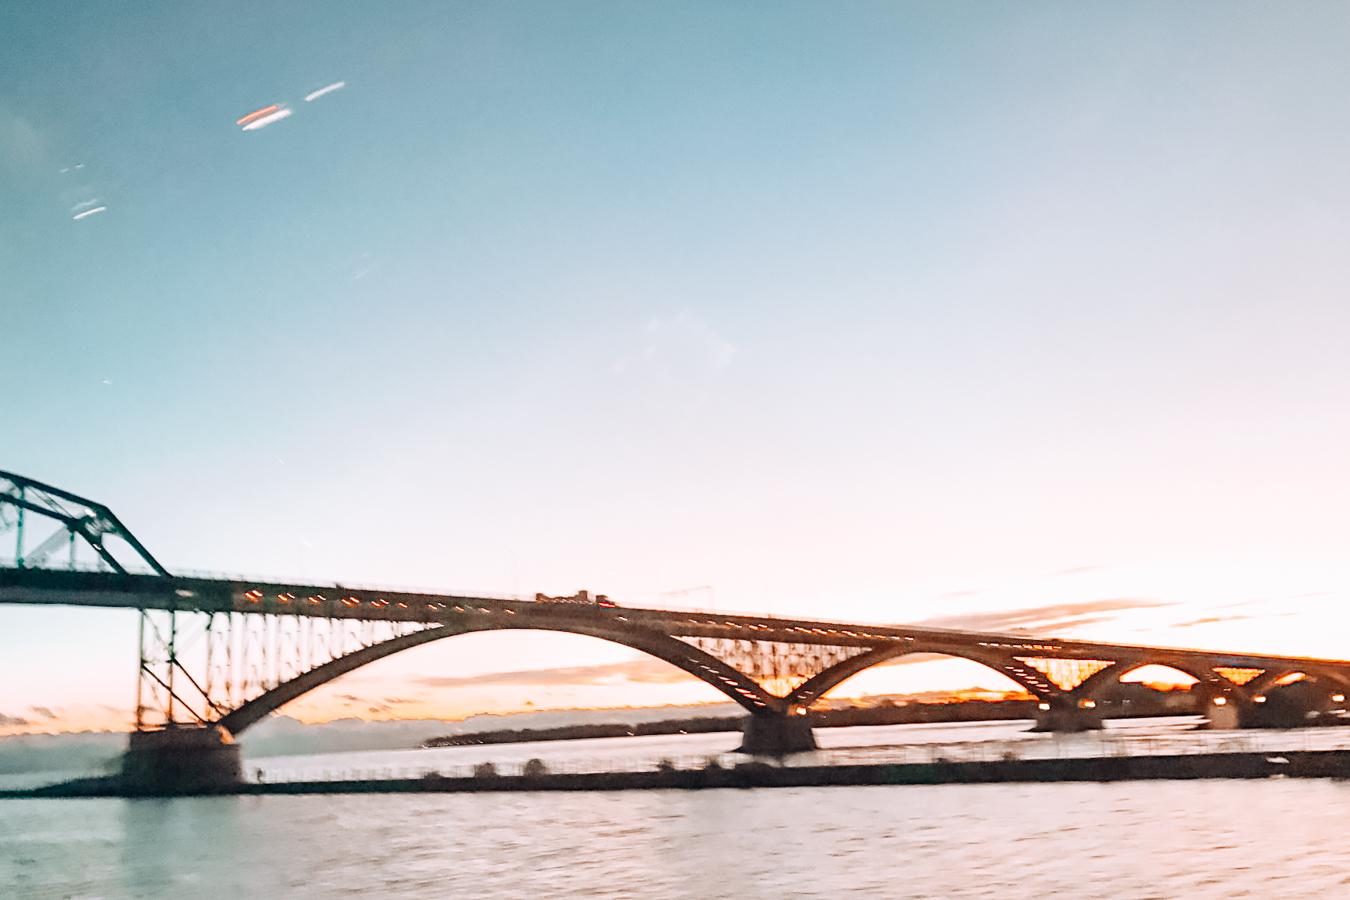 Bridge in Buffalo